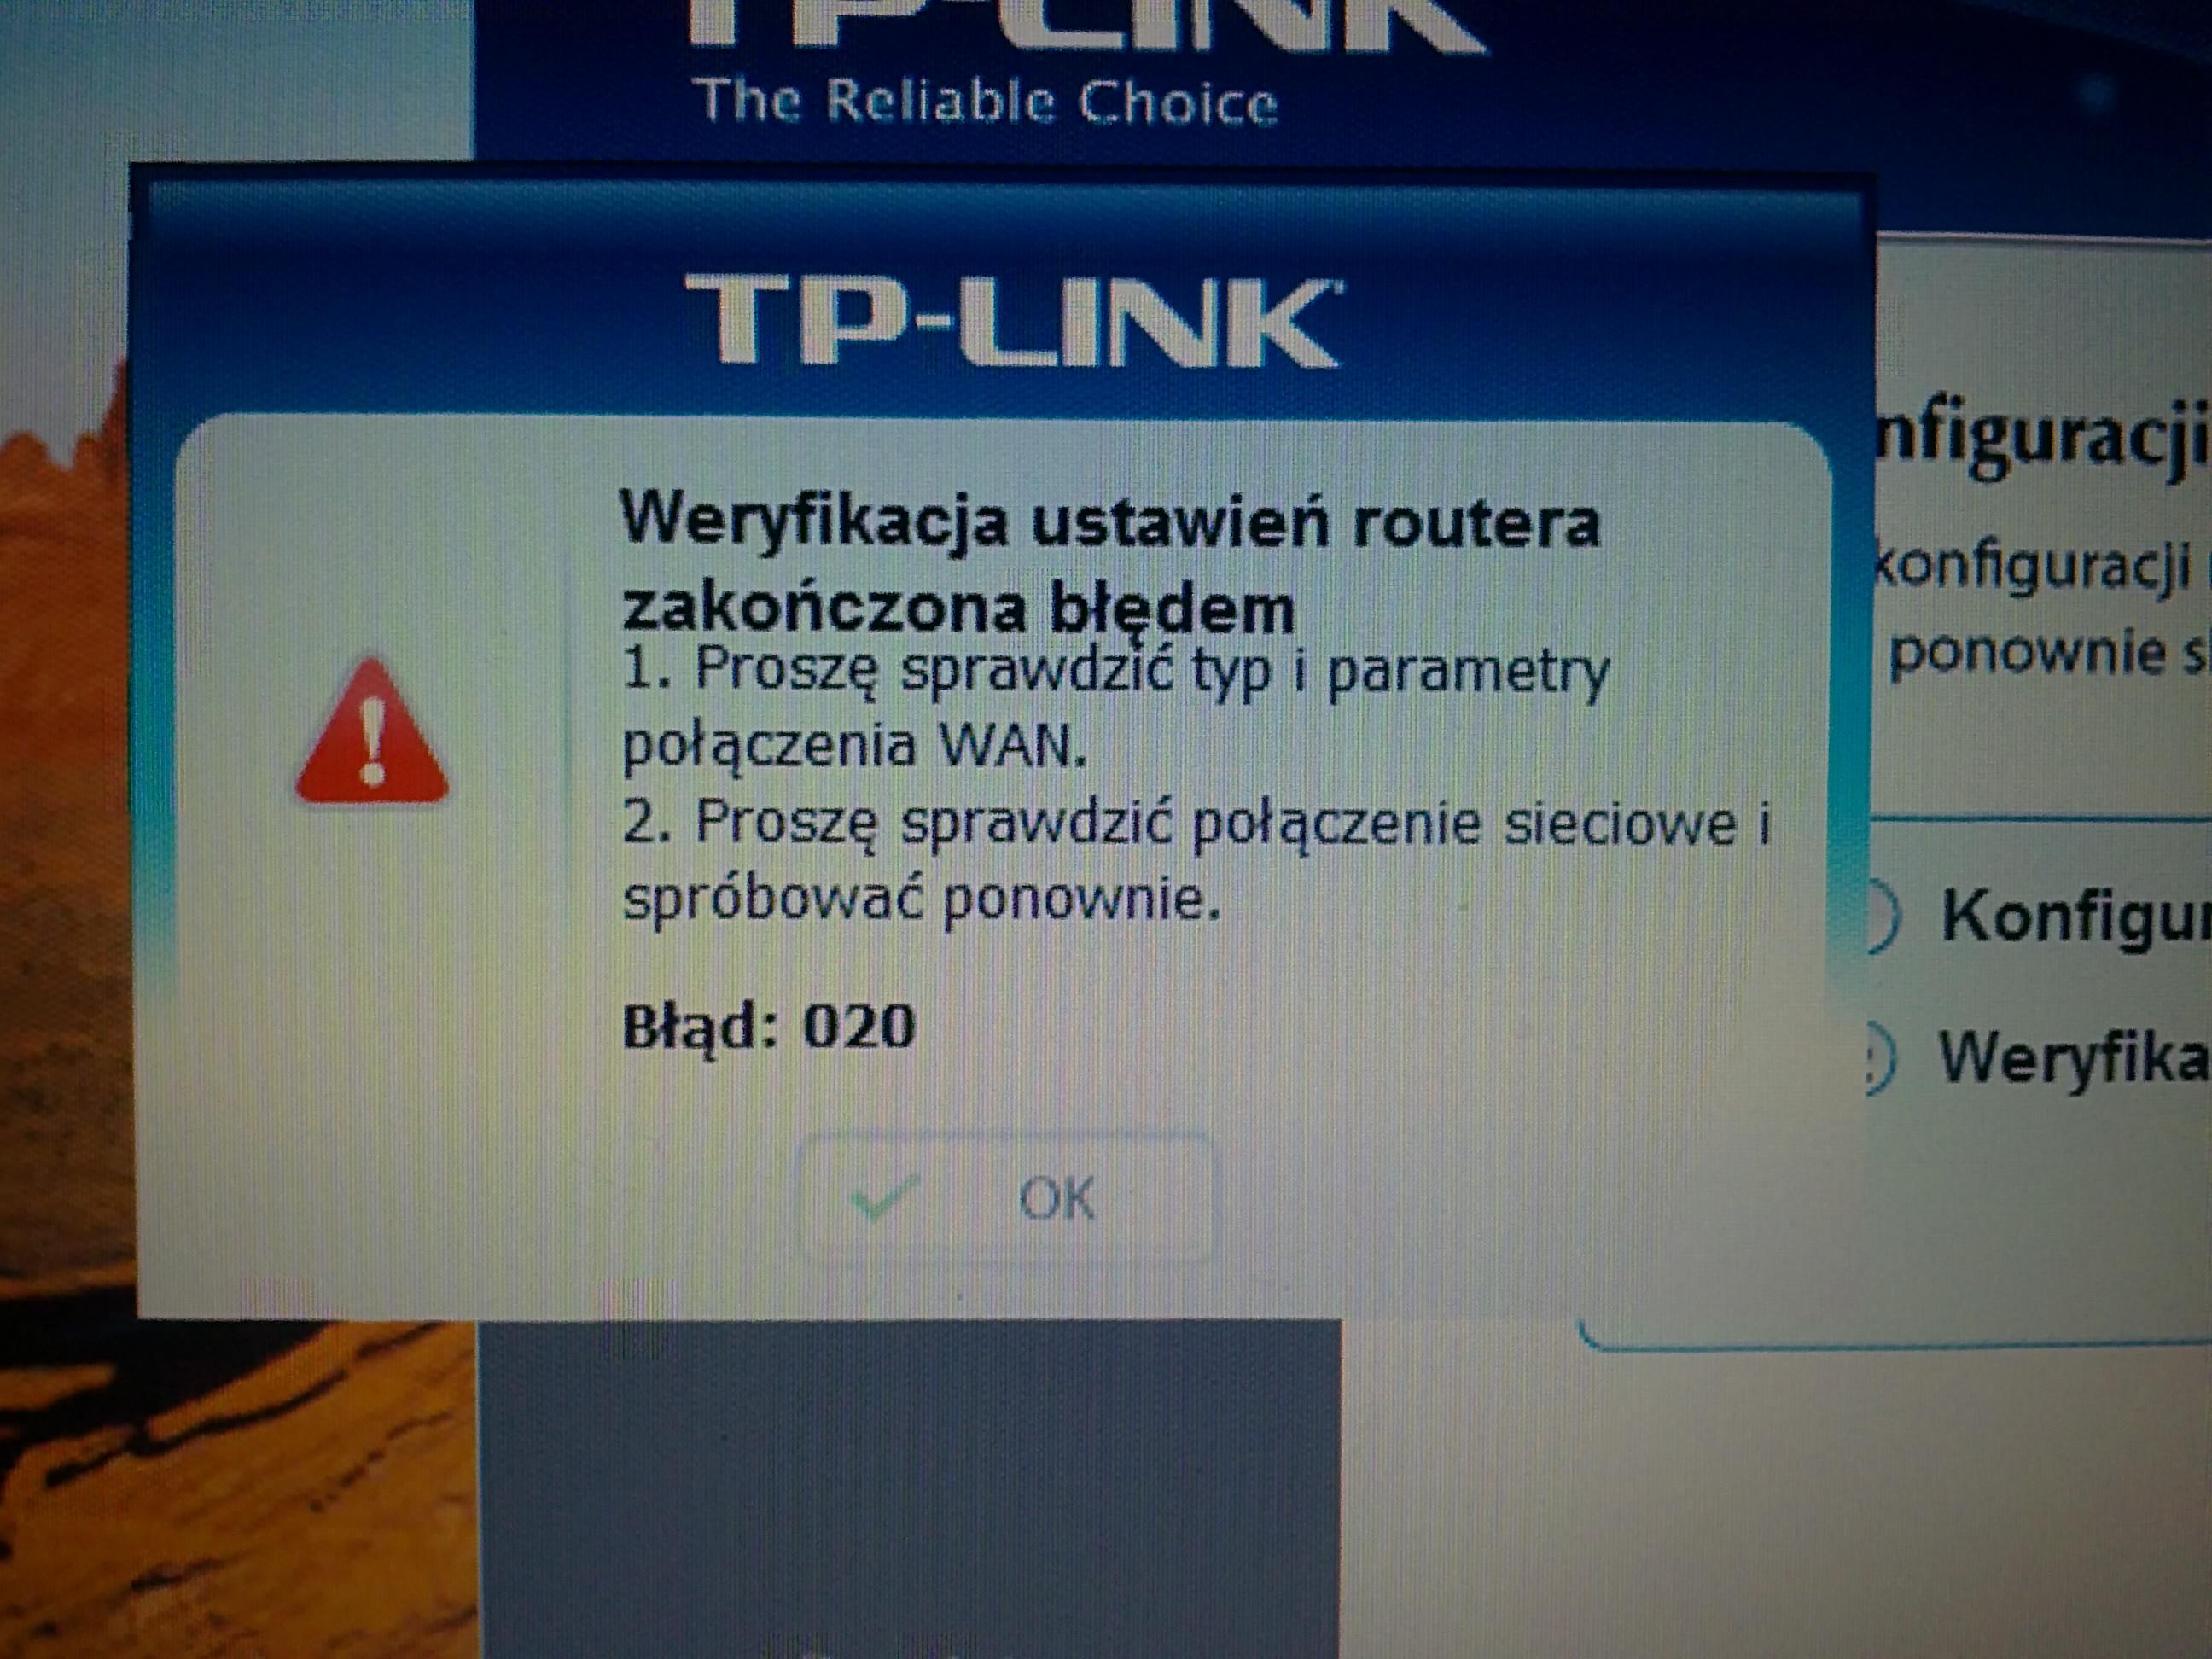 TP-LINK TD-W8951ND - Nie mog� skonfiugurowa�.